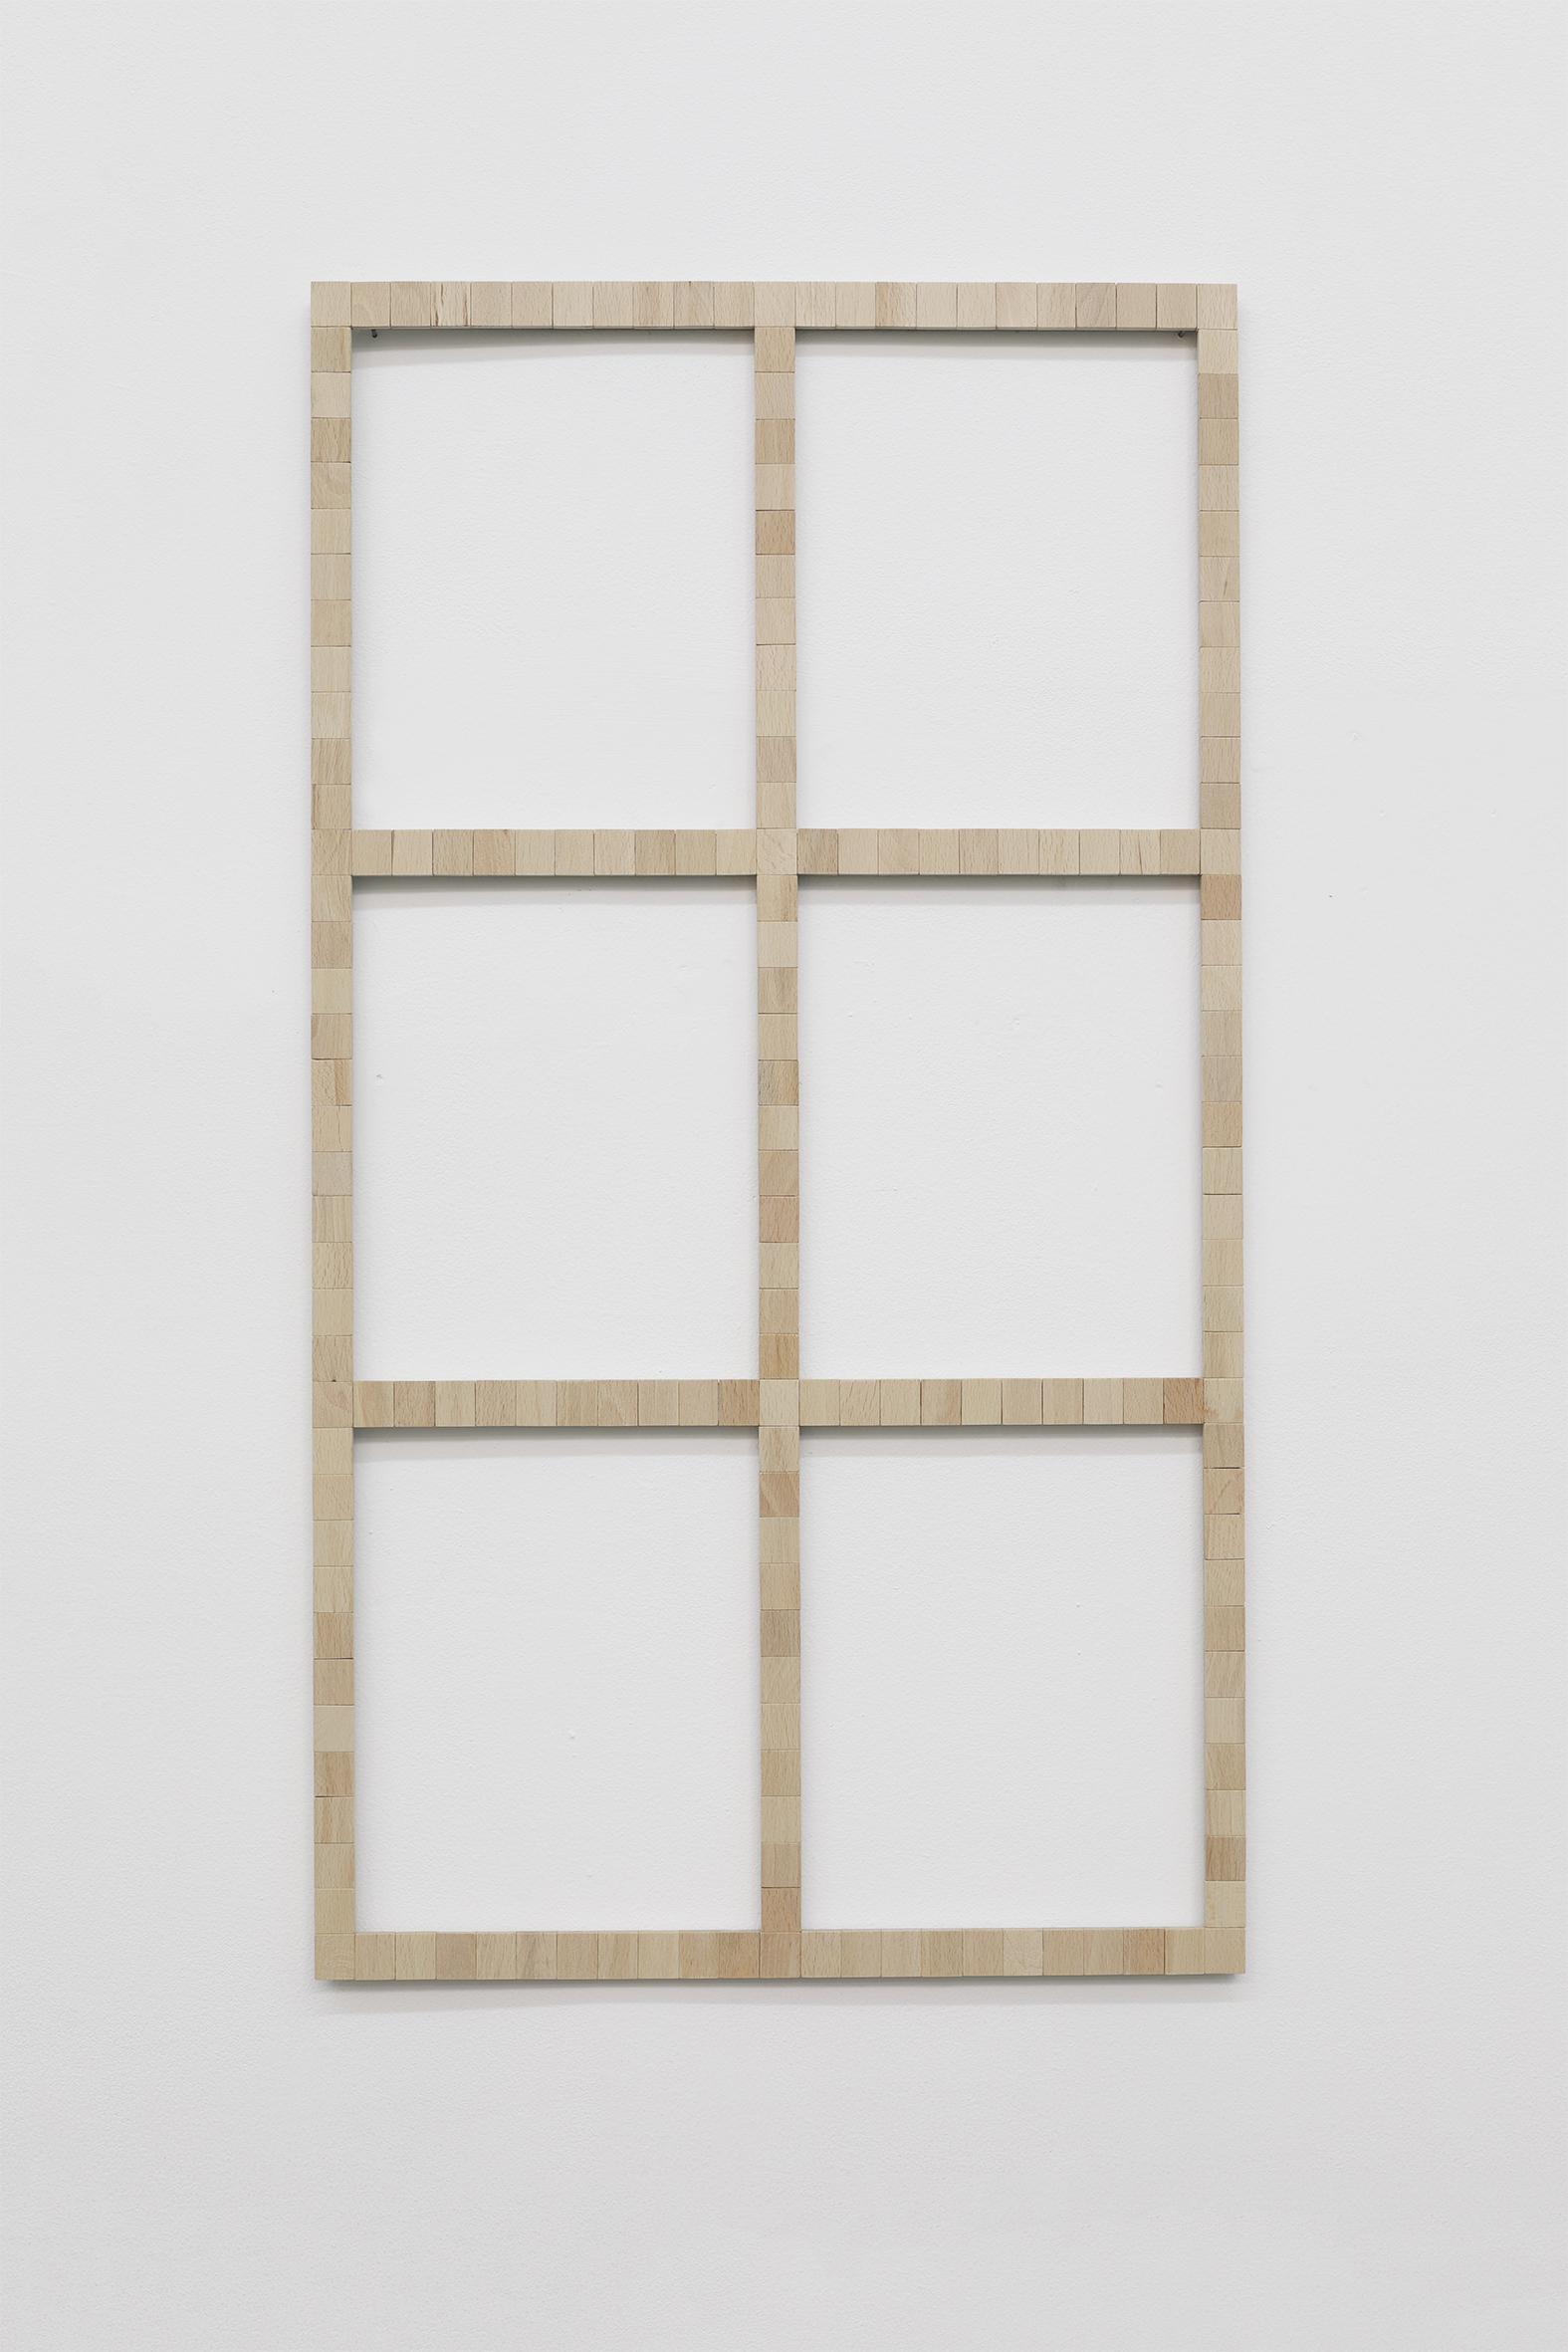 Word-Window (Universitatstrasse 29)  , 2019  Fichas de scrabble / Scrabble tiles  74 x 42.5 cm